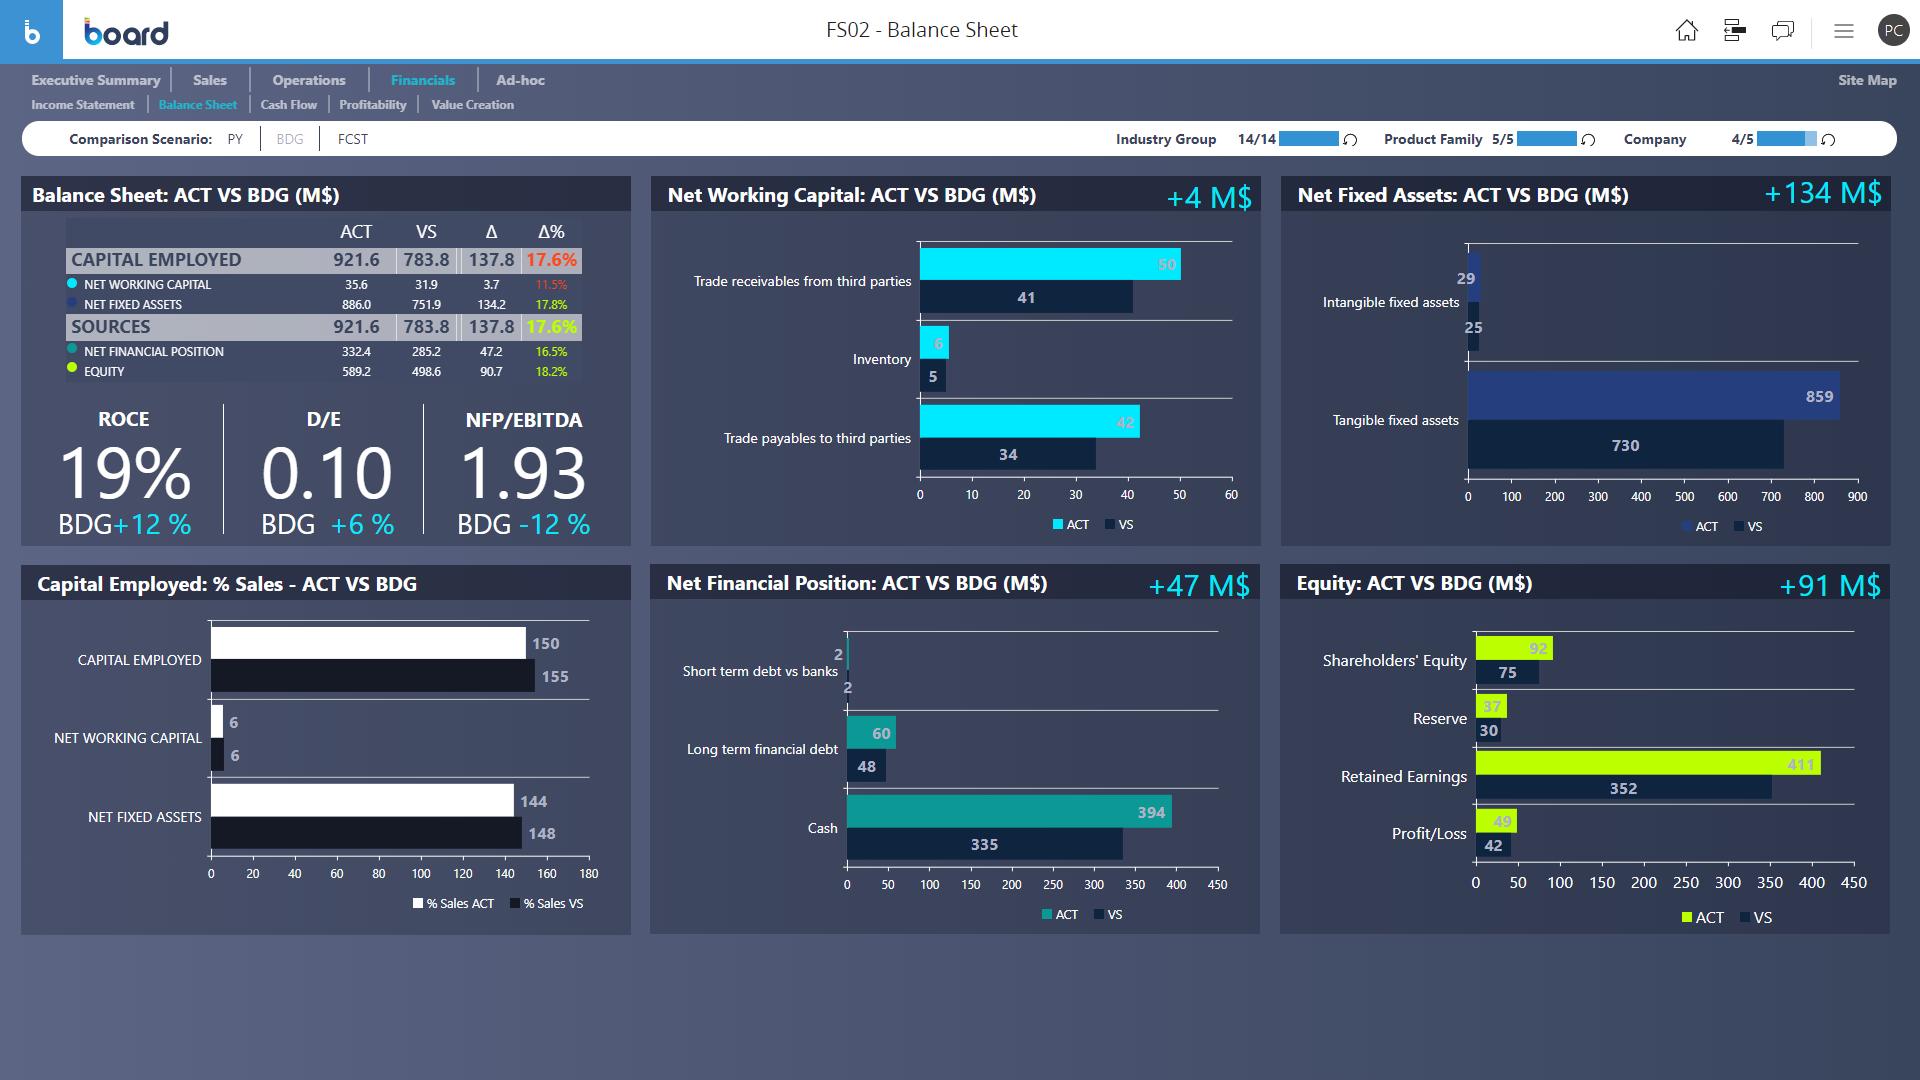 Sample of Balance Sheet Analysis software dashboard